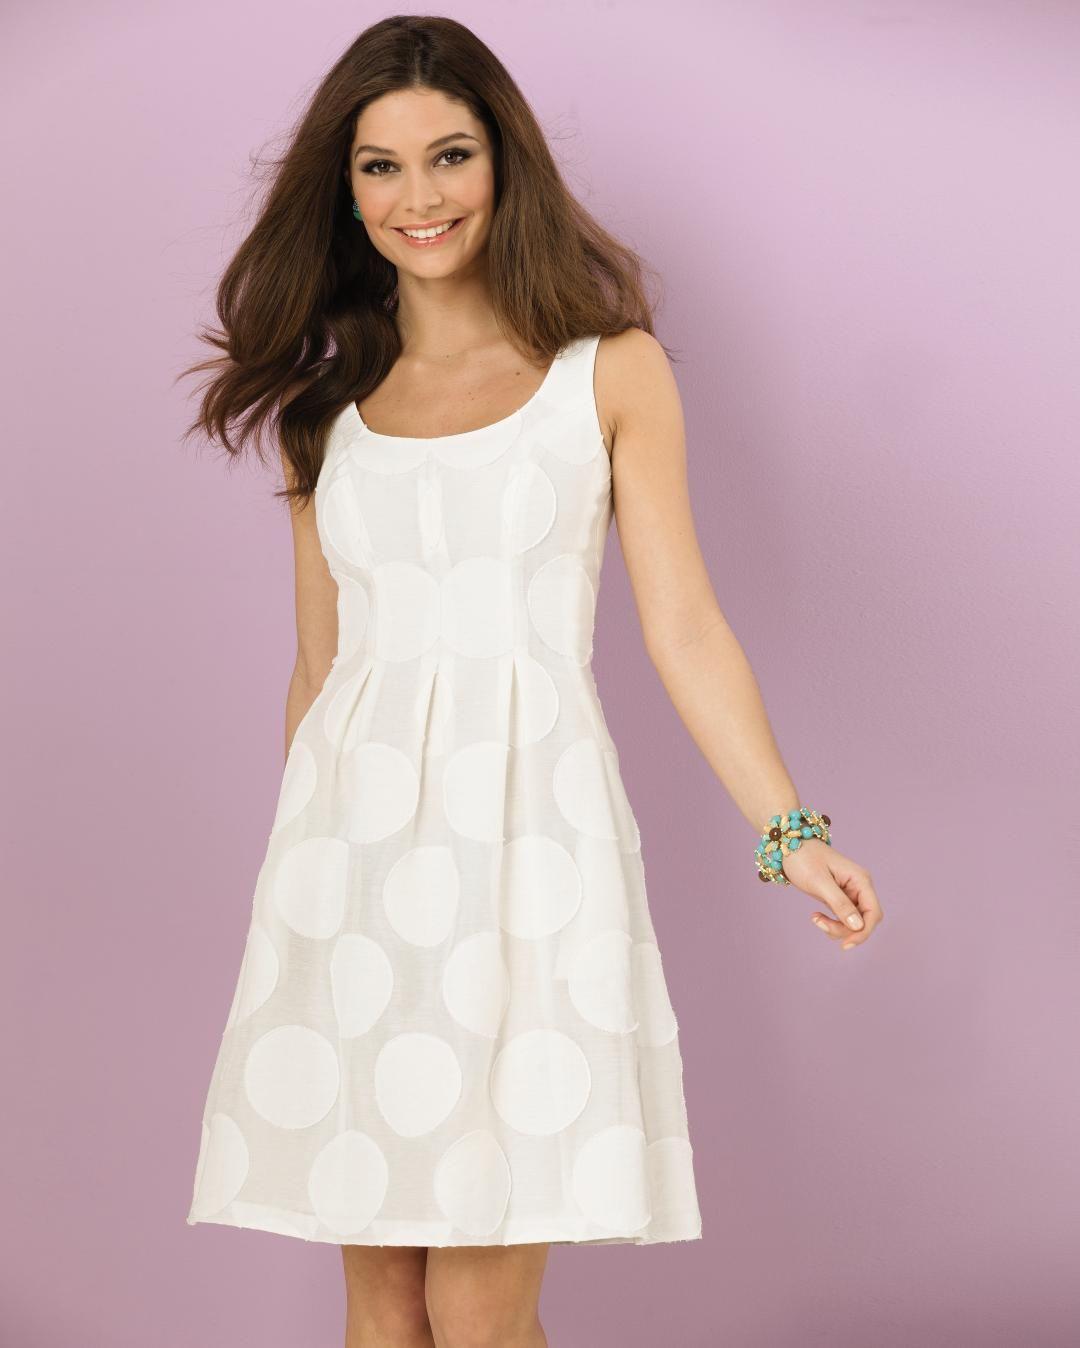 7ceef1166d3 Nine West polka dot fit   flare  dress.  SteinMart